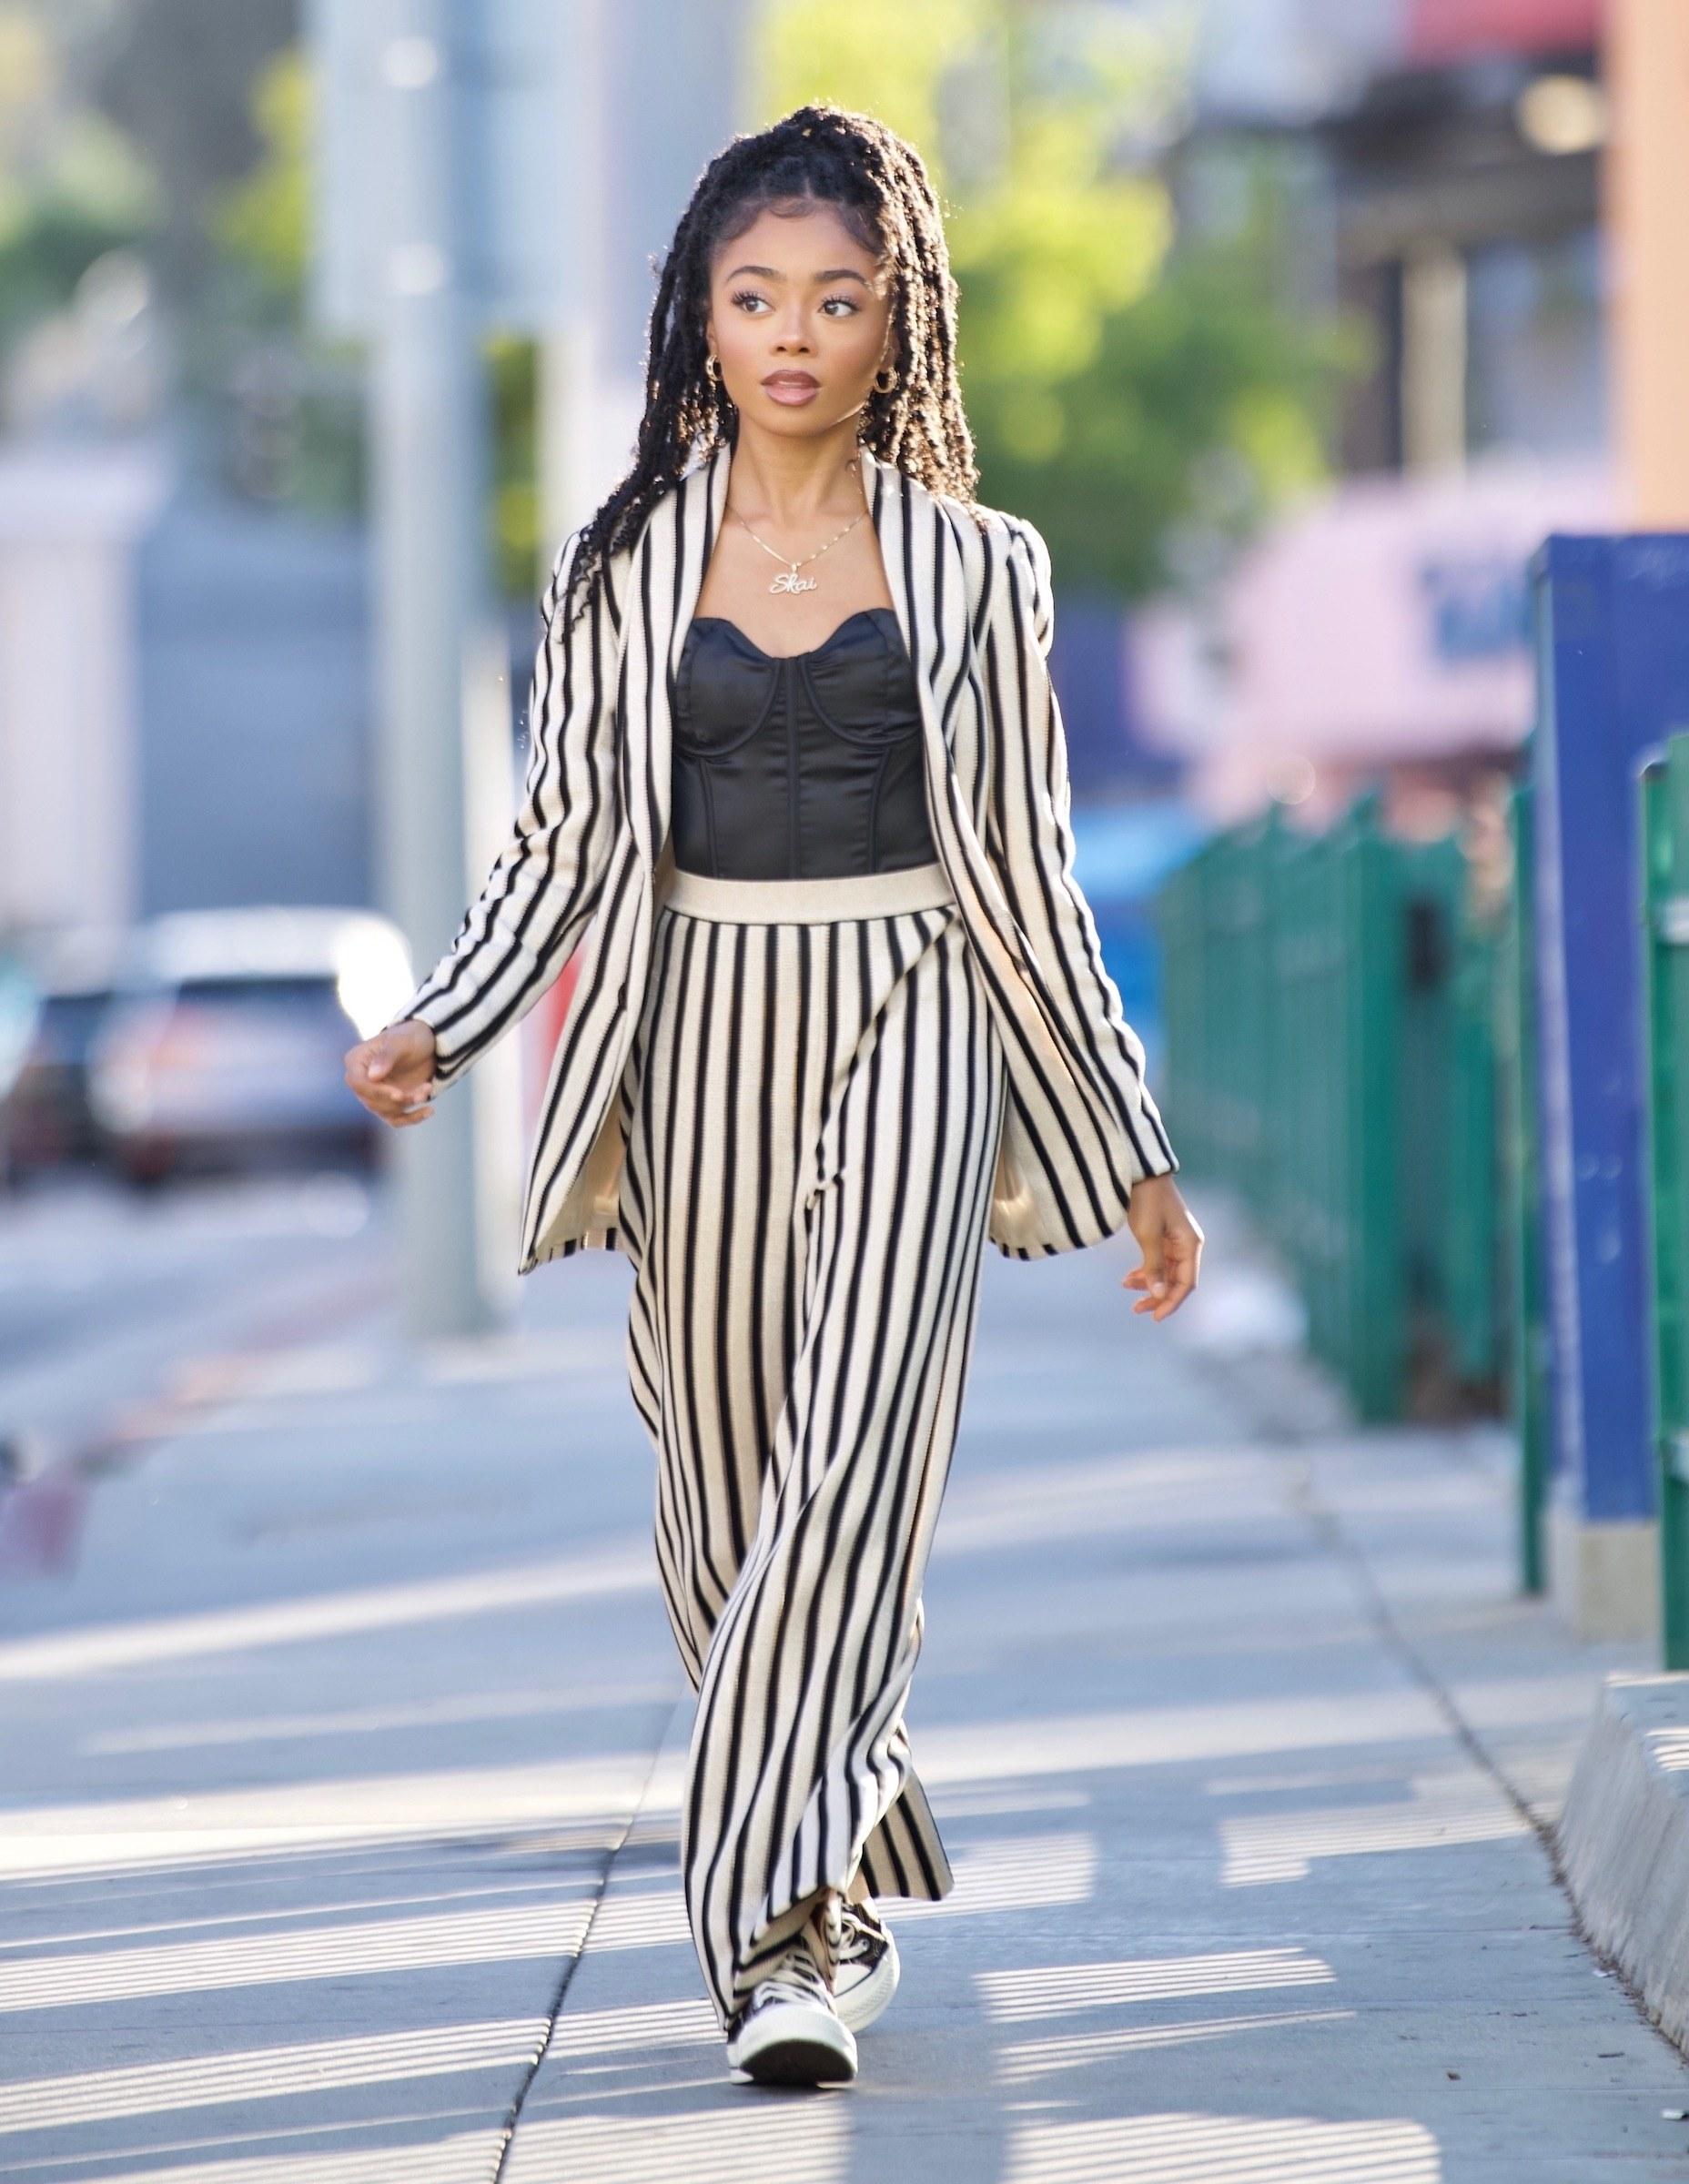 Skai Jackson wears a pinstripe pantsuit and black corset top while walking around in Los Angeles